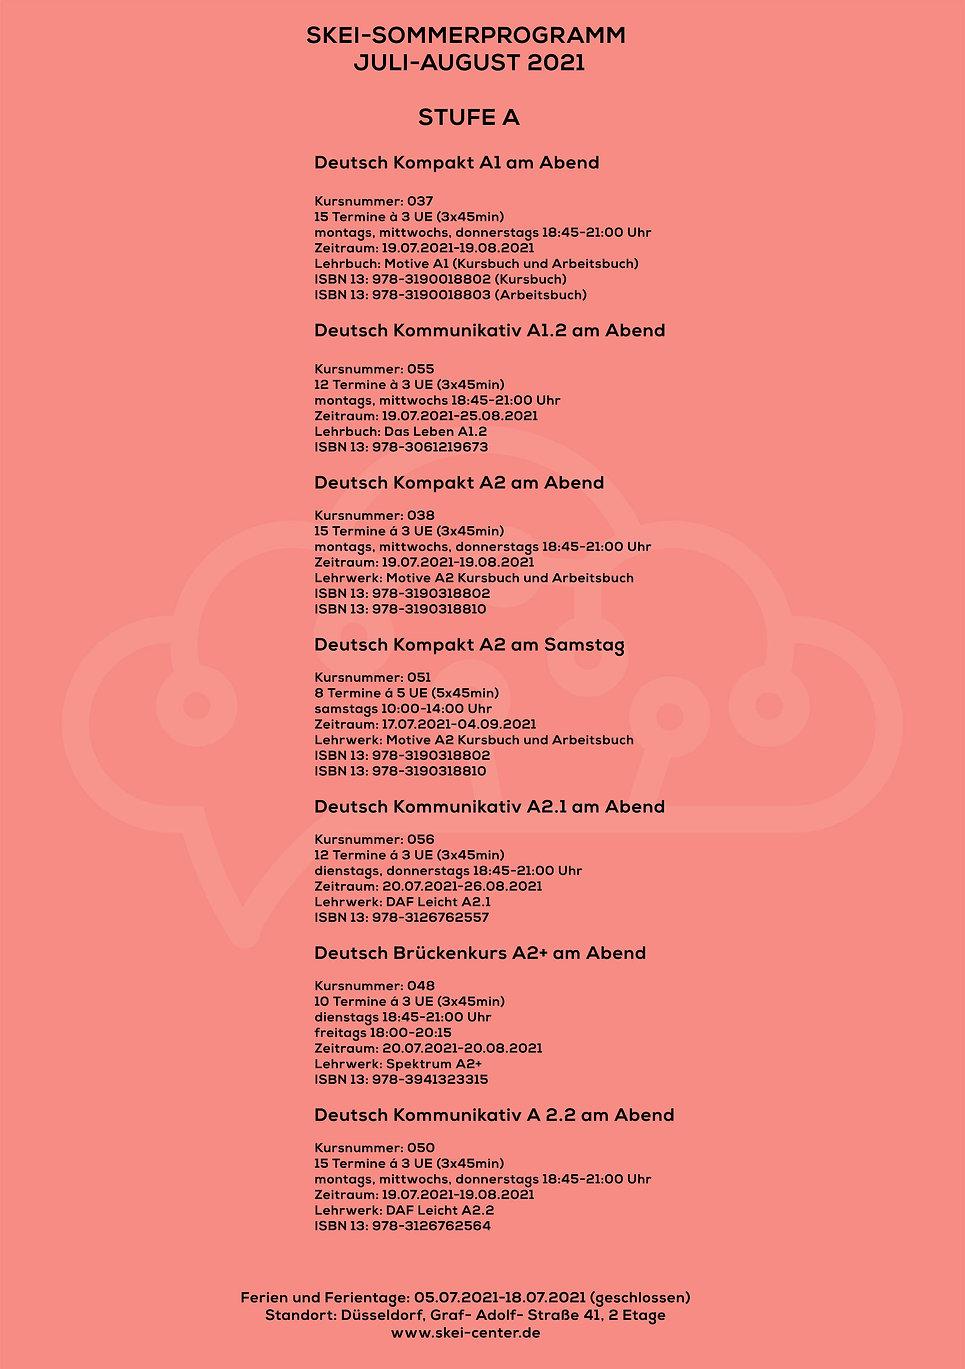 Kursprogramm STUFE A_18062021 Kopie.jpg